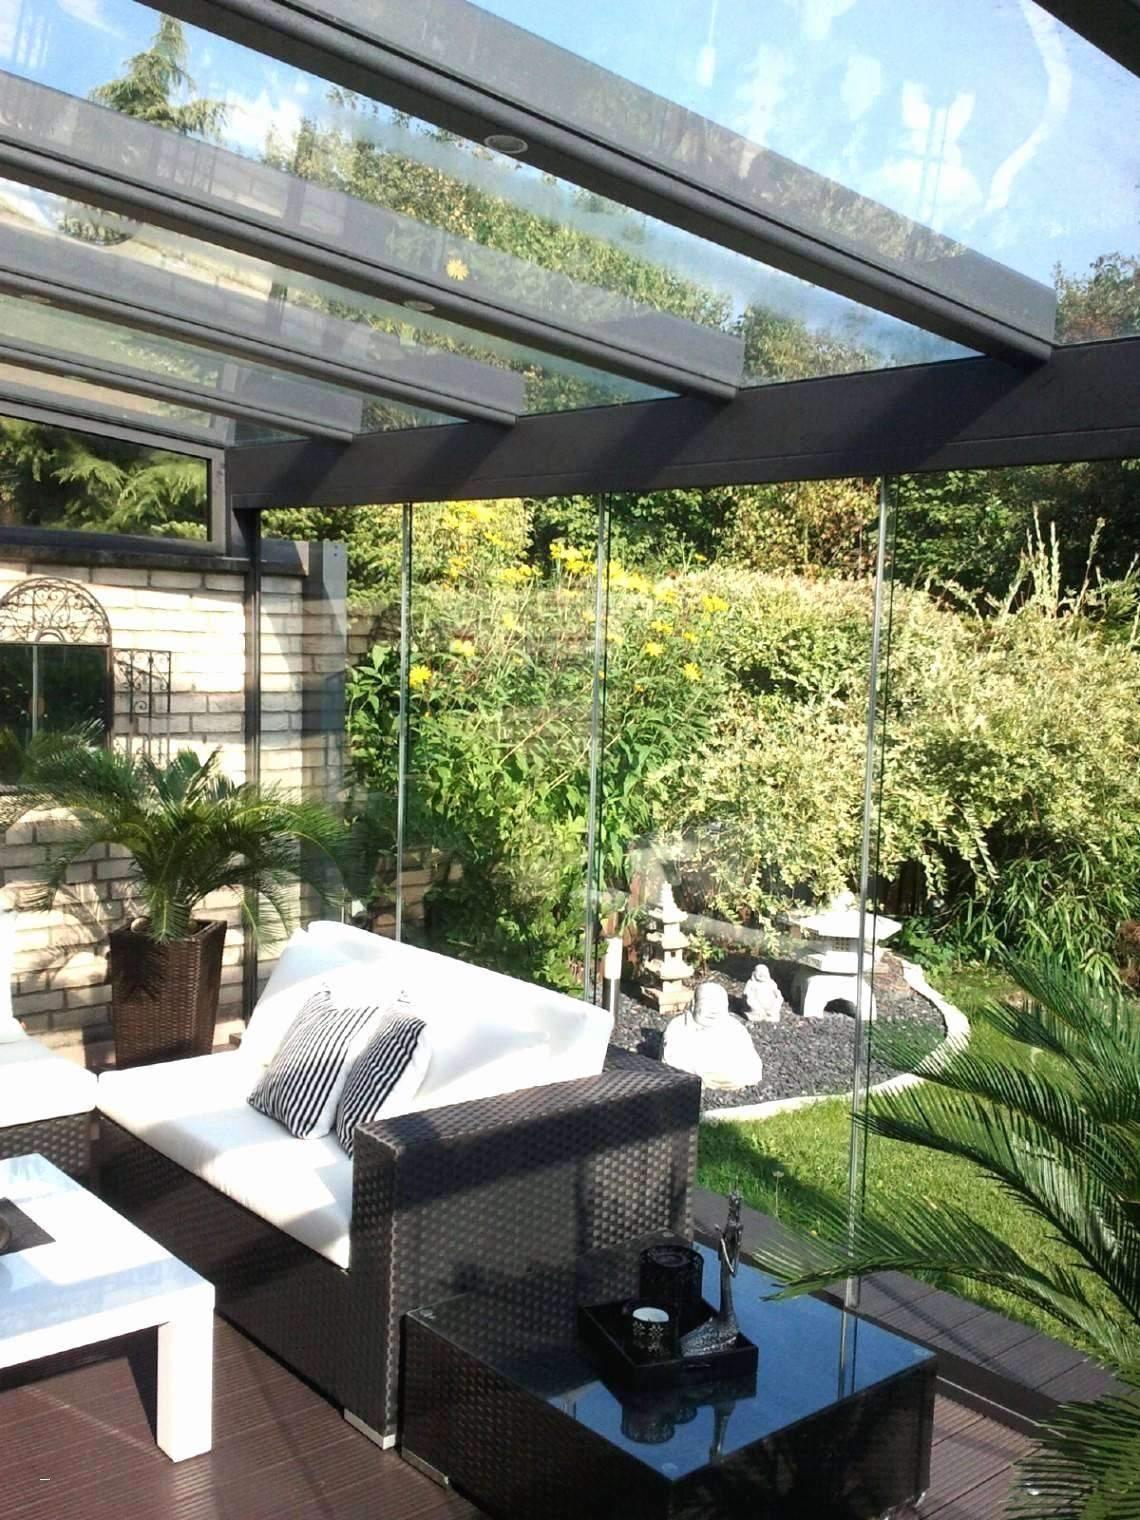 gestaltungsideen garten luxus kleingarten gestalten ideen of gestaltungsideen garten